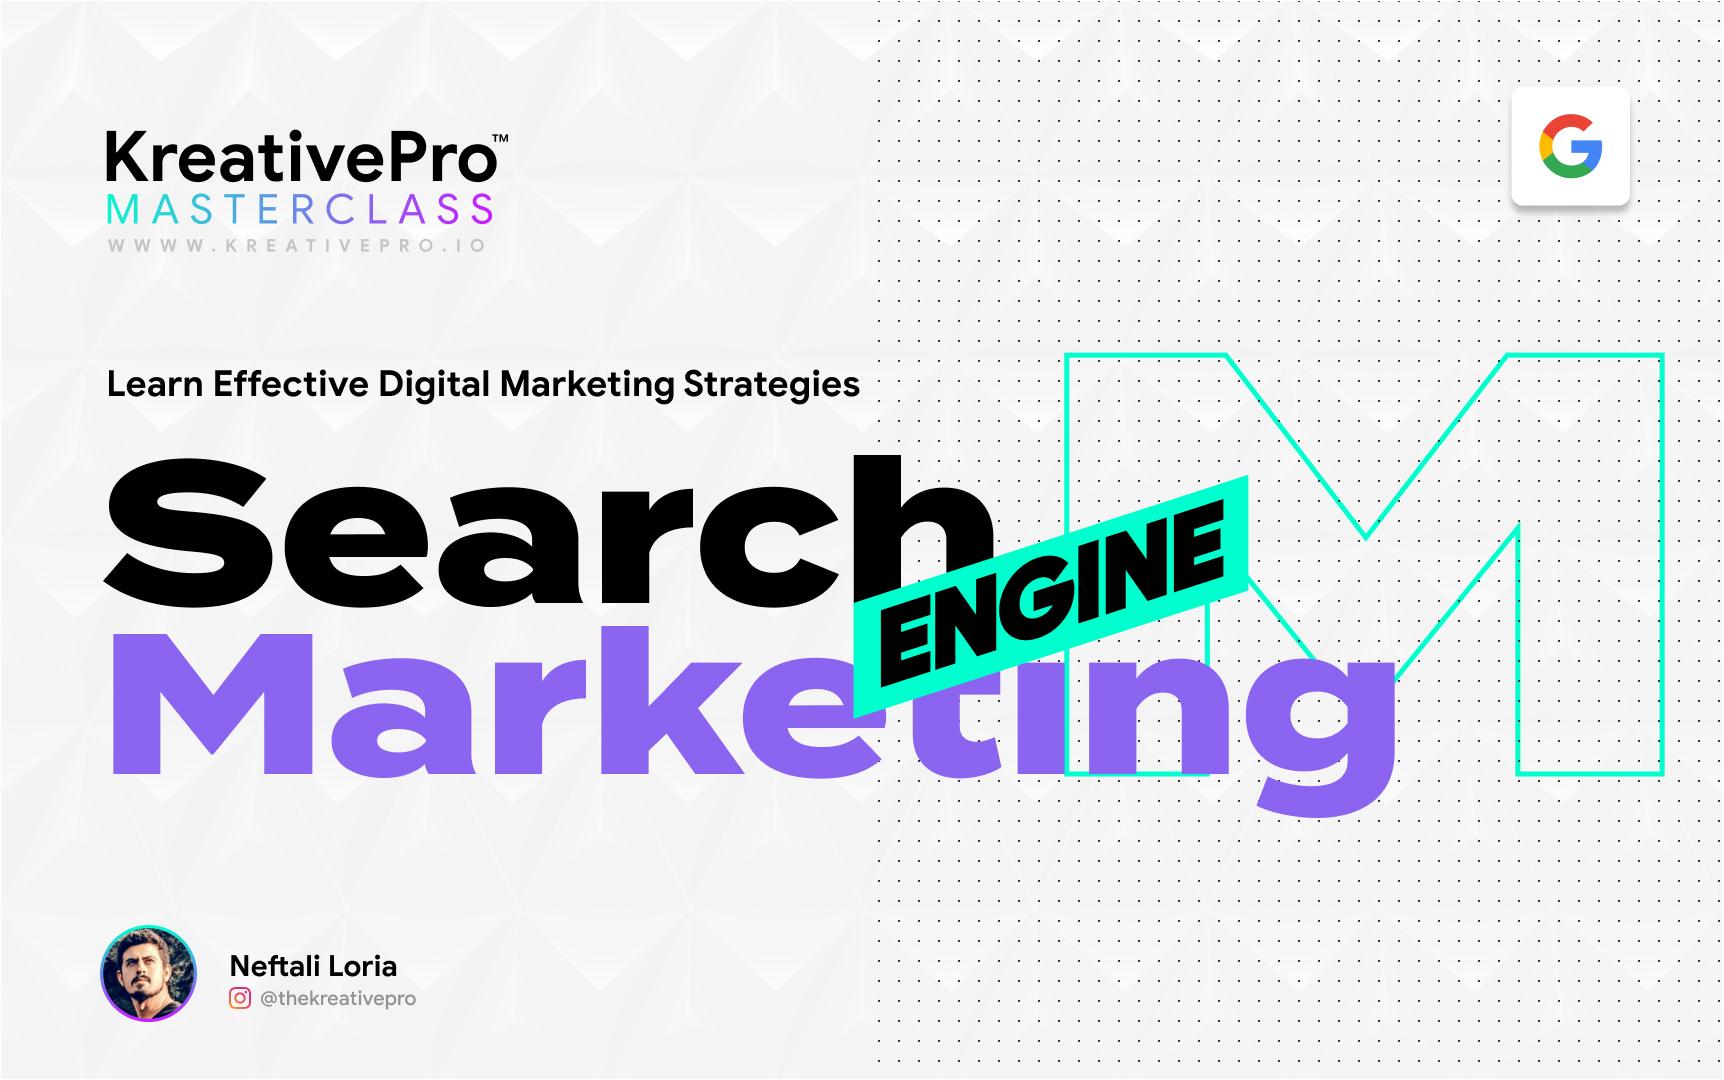 Marketing 3.2 - Search Engine Marketing